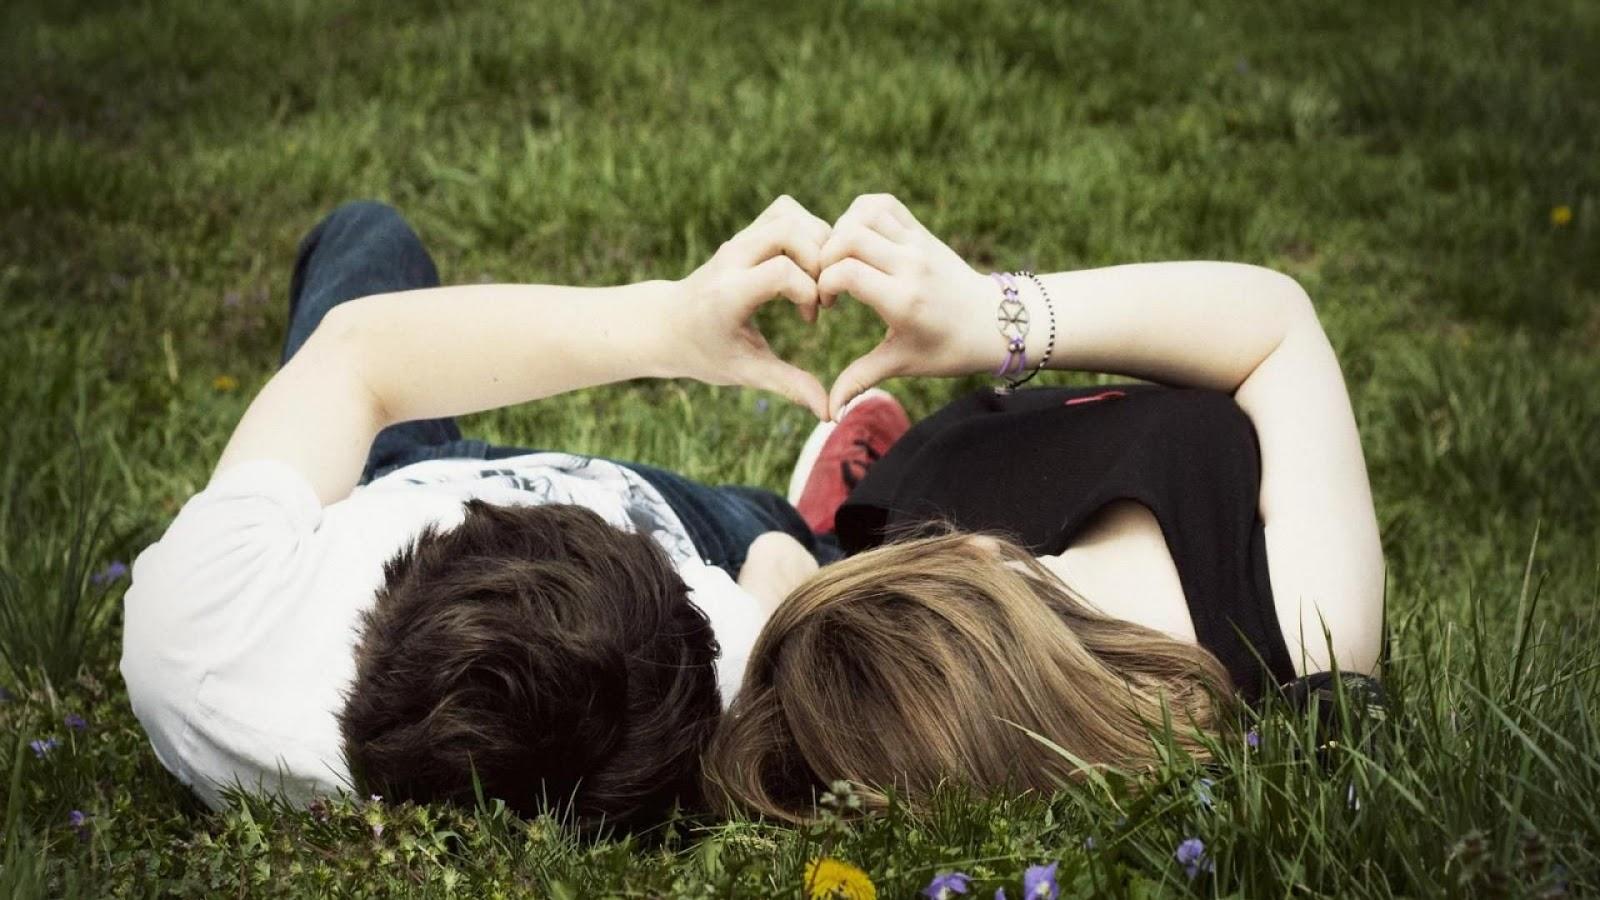 Gambar Cinta Hati Love Romantis 88 Gambar Gambar